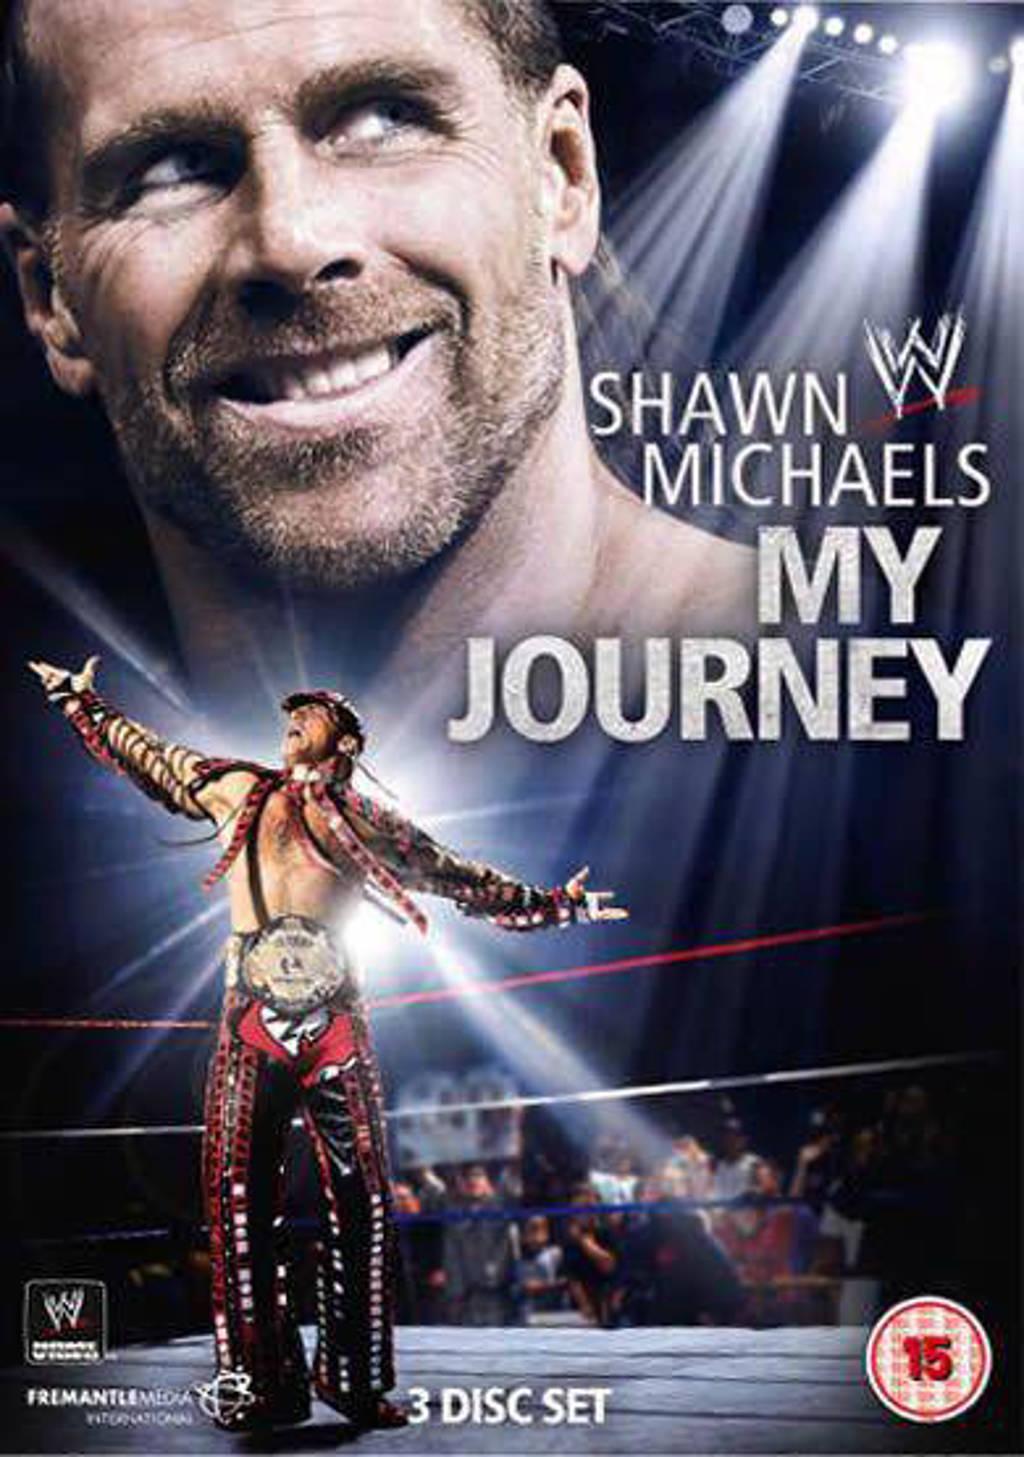 WWE - Shawn Michaels - My Journey (DVD)